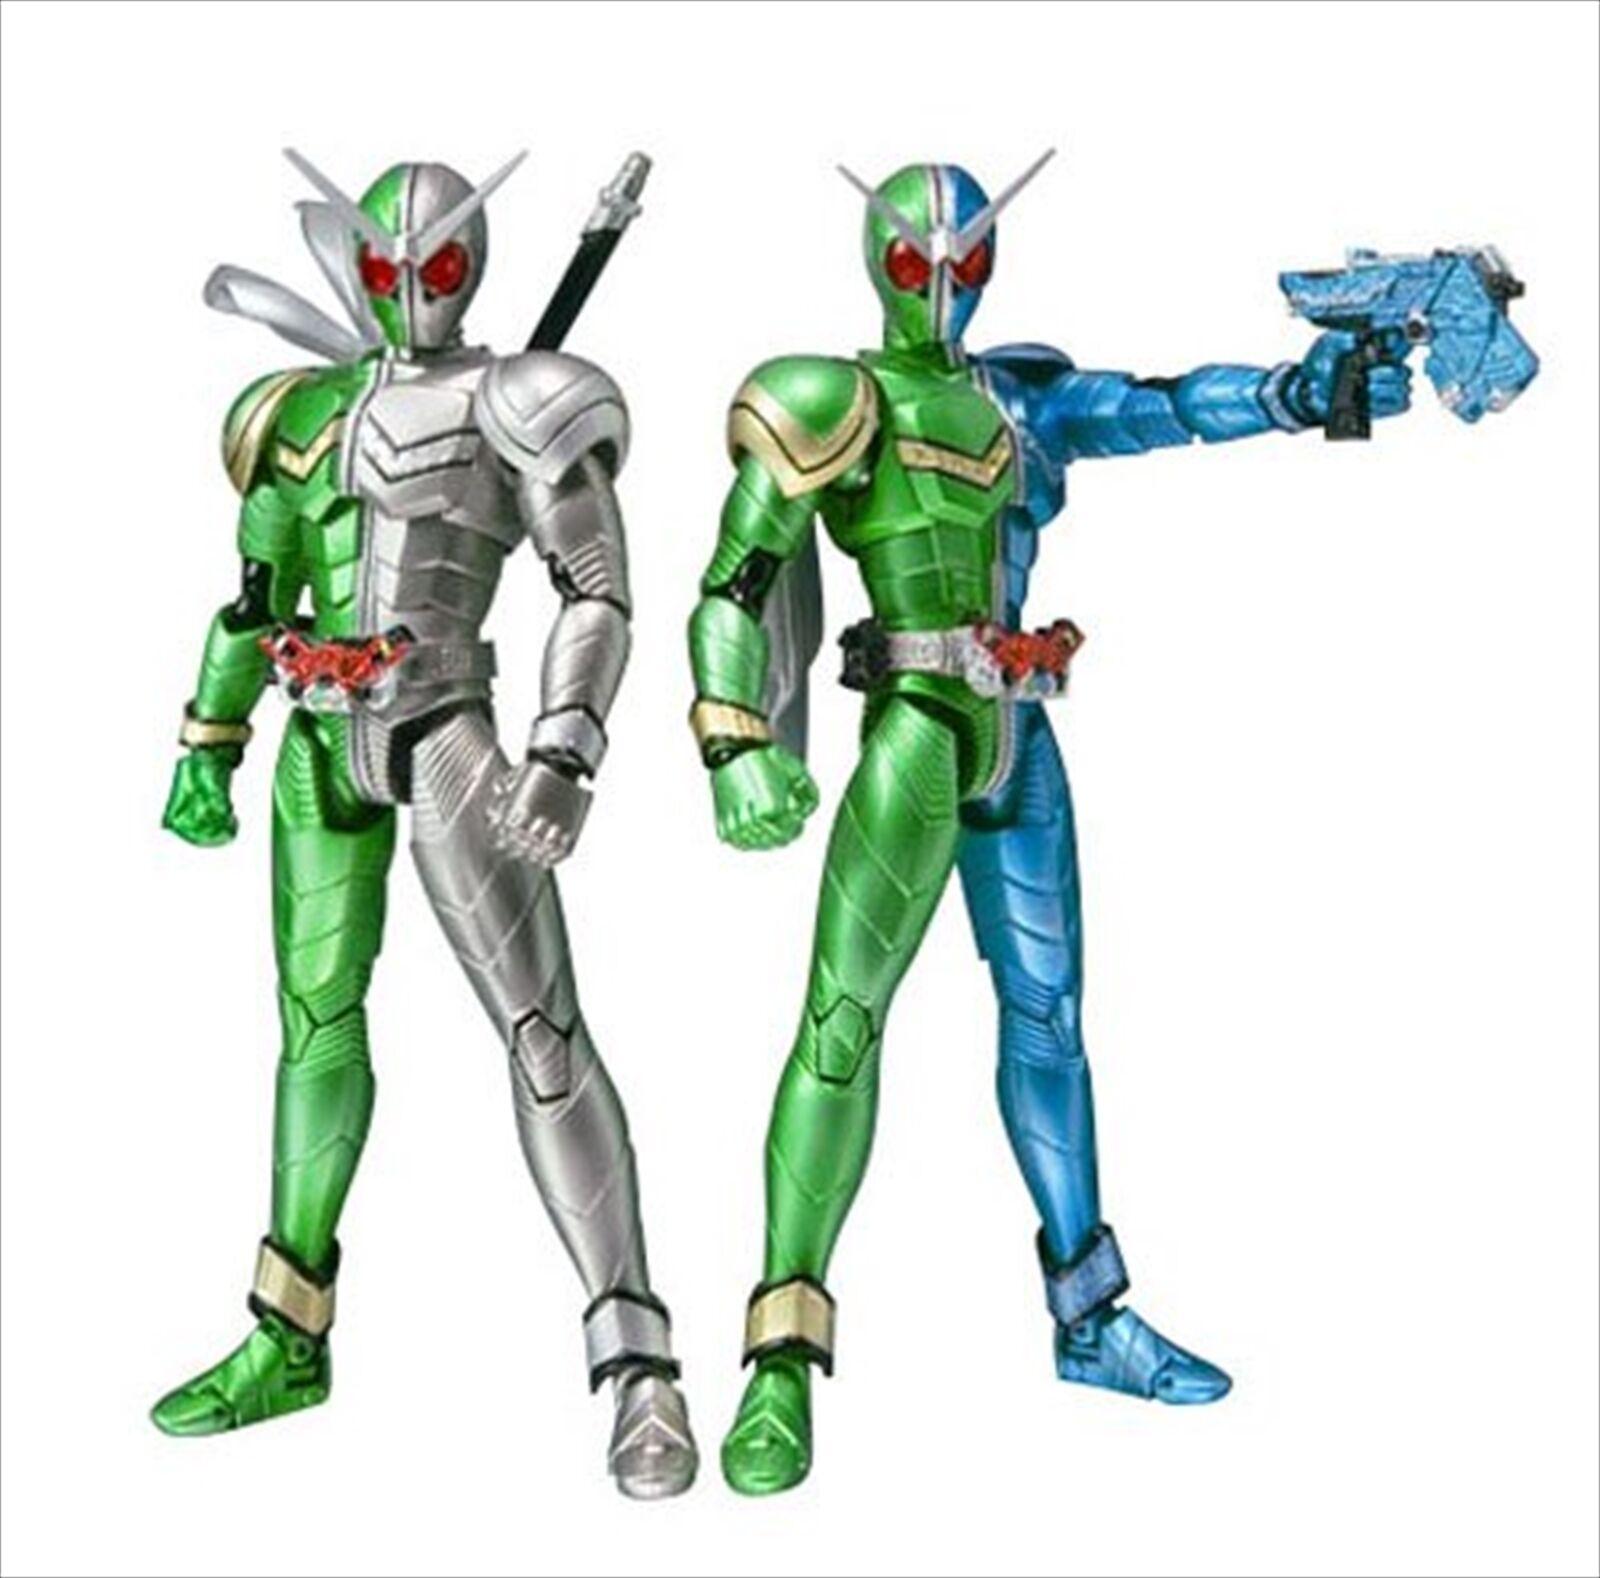 Bandai S.H. Figuarts Masked Kamen Rider W Cyclone Trigger & Cyclone Metal Figure